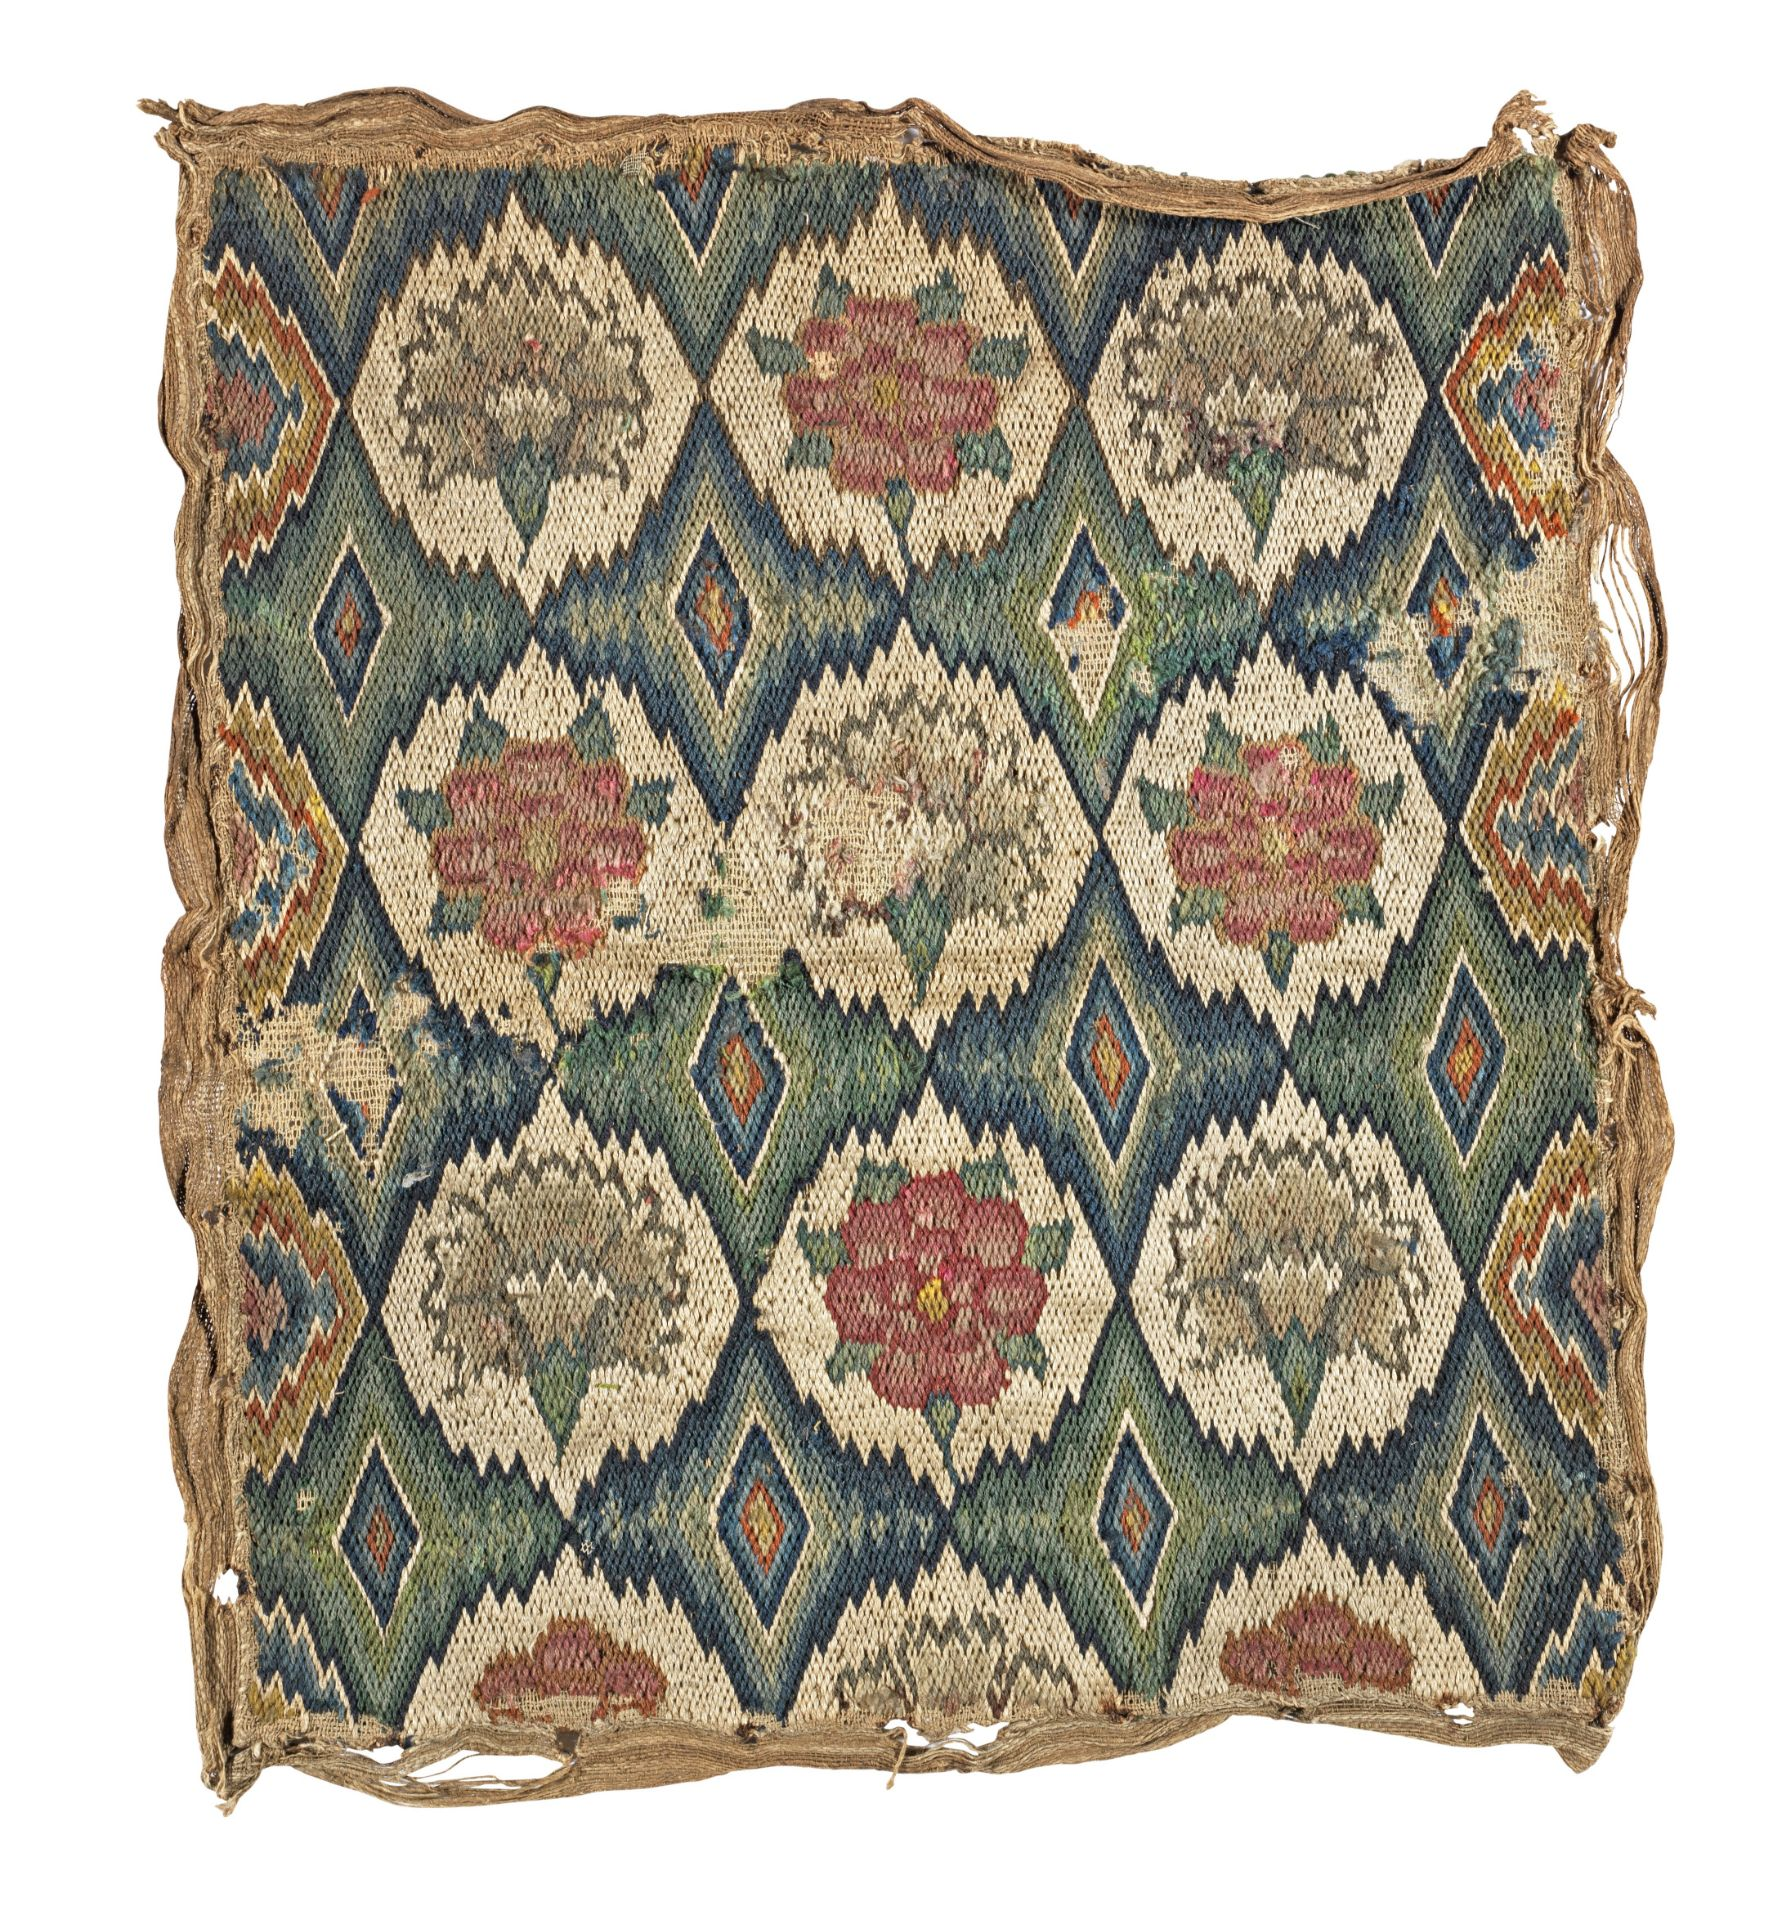 Los 531 - A Charles II needlework seat cover, circa 1670